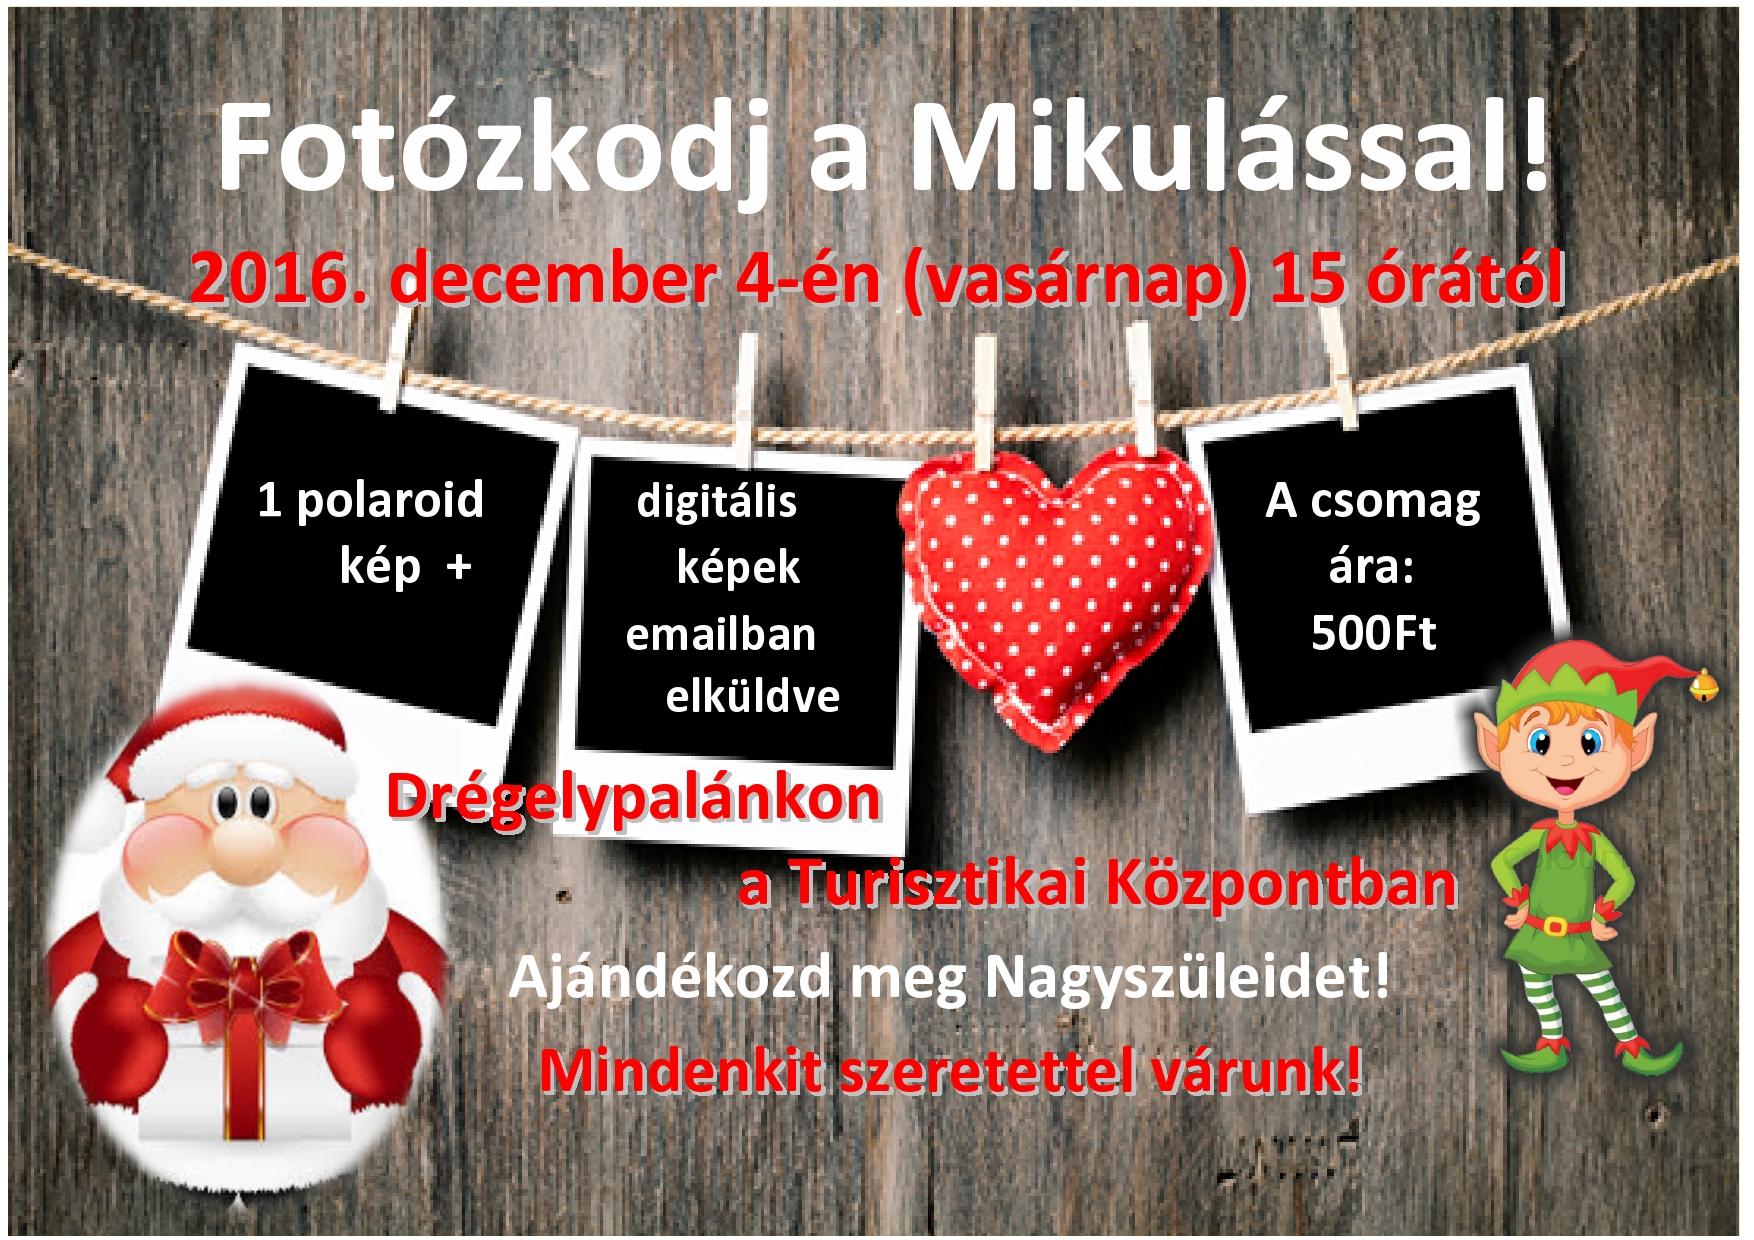 fotozkodj-a-mikulassal-szerk-page0001-2